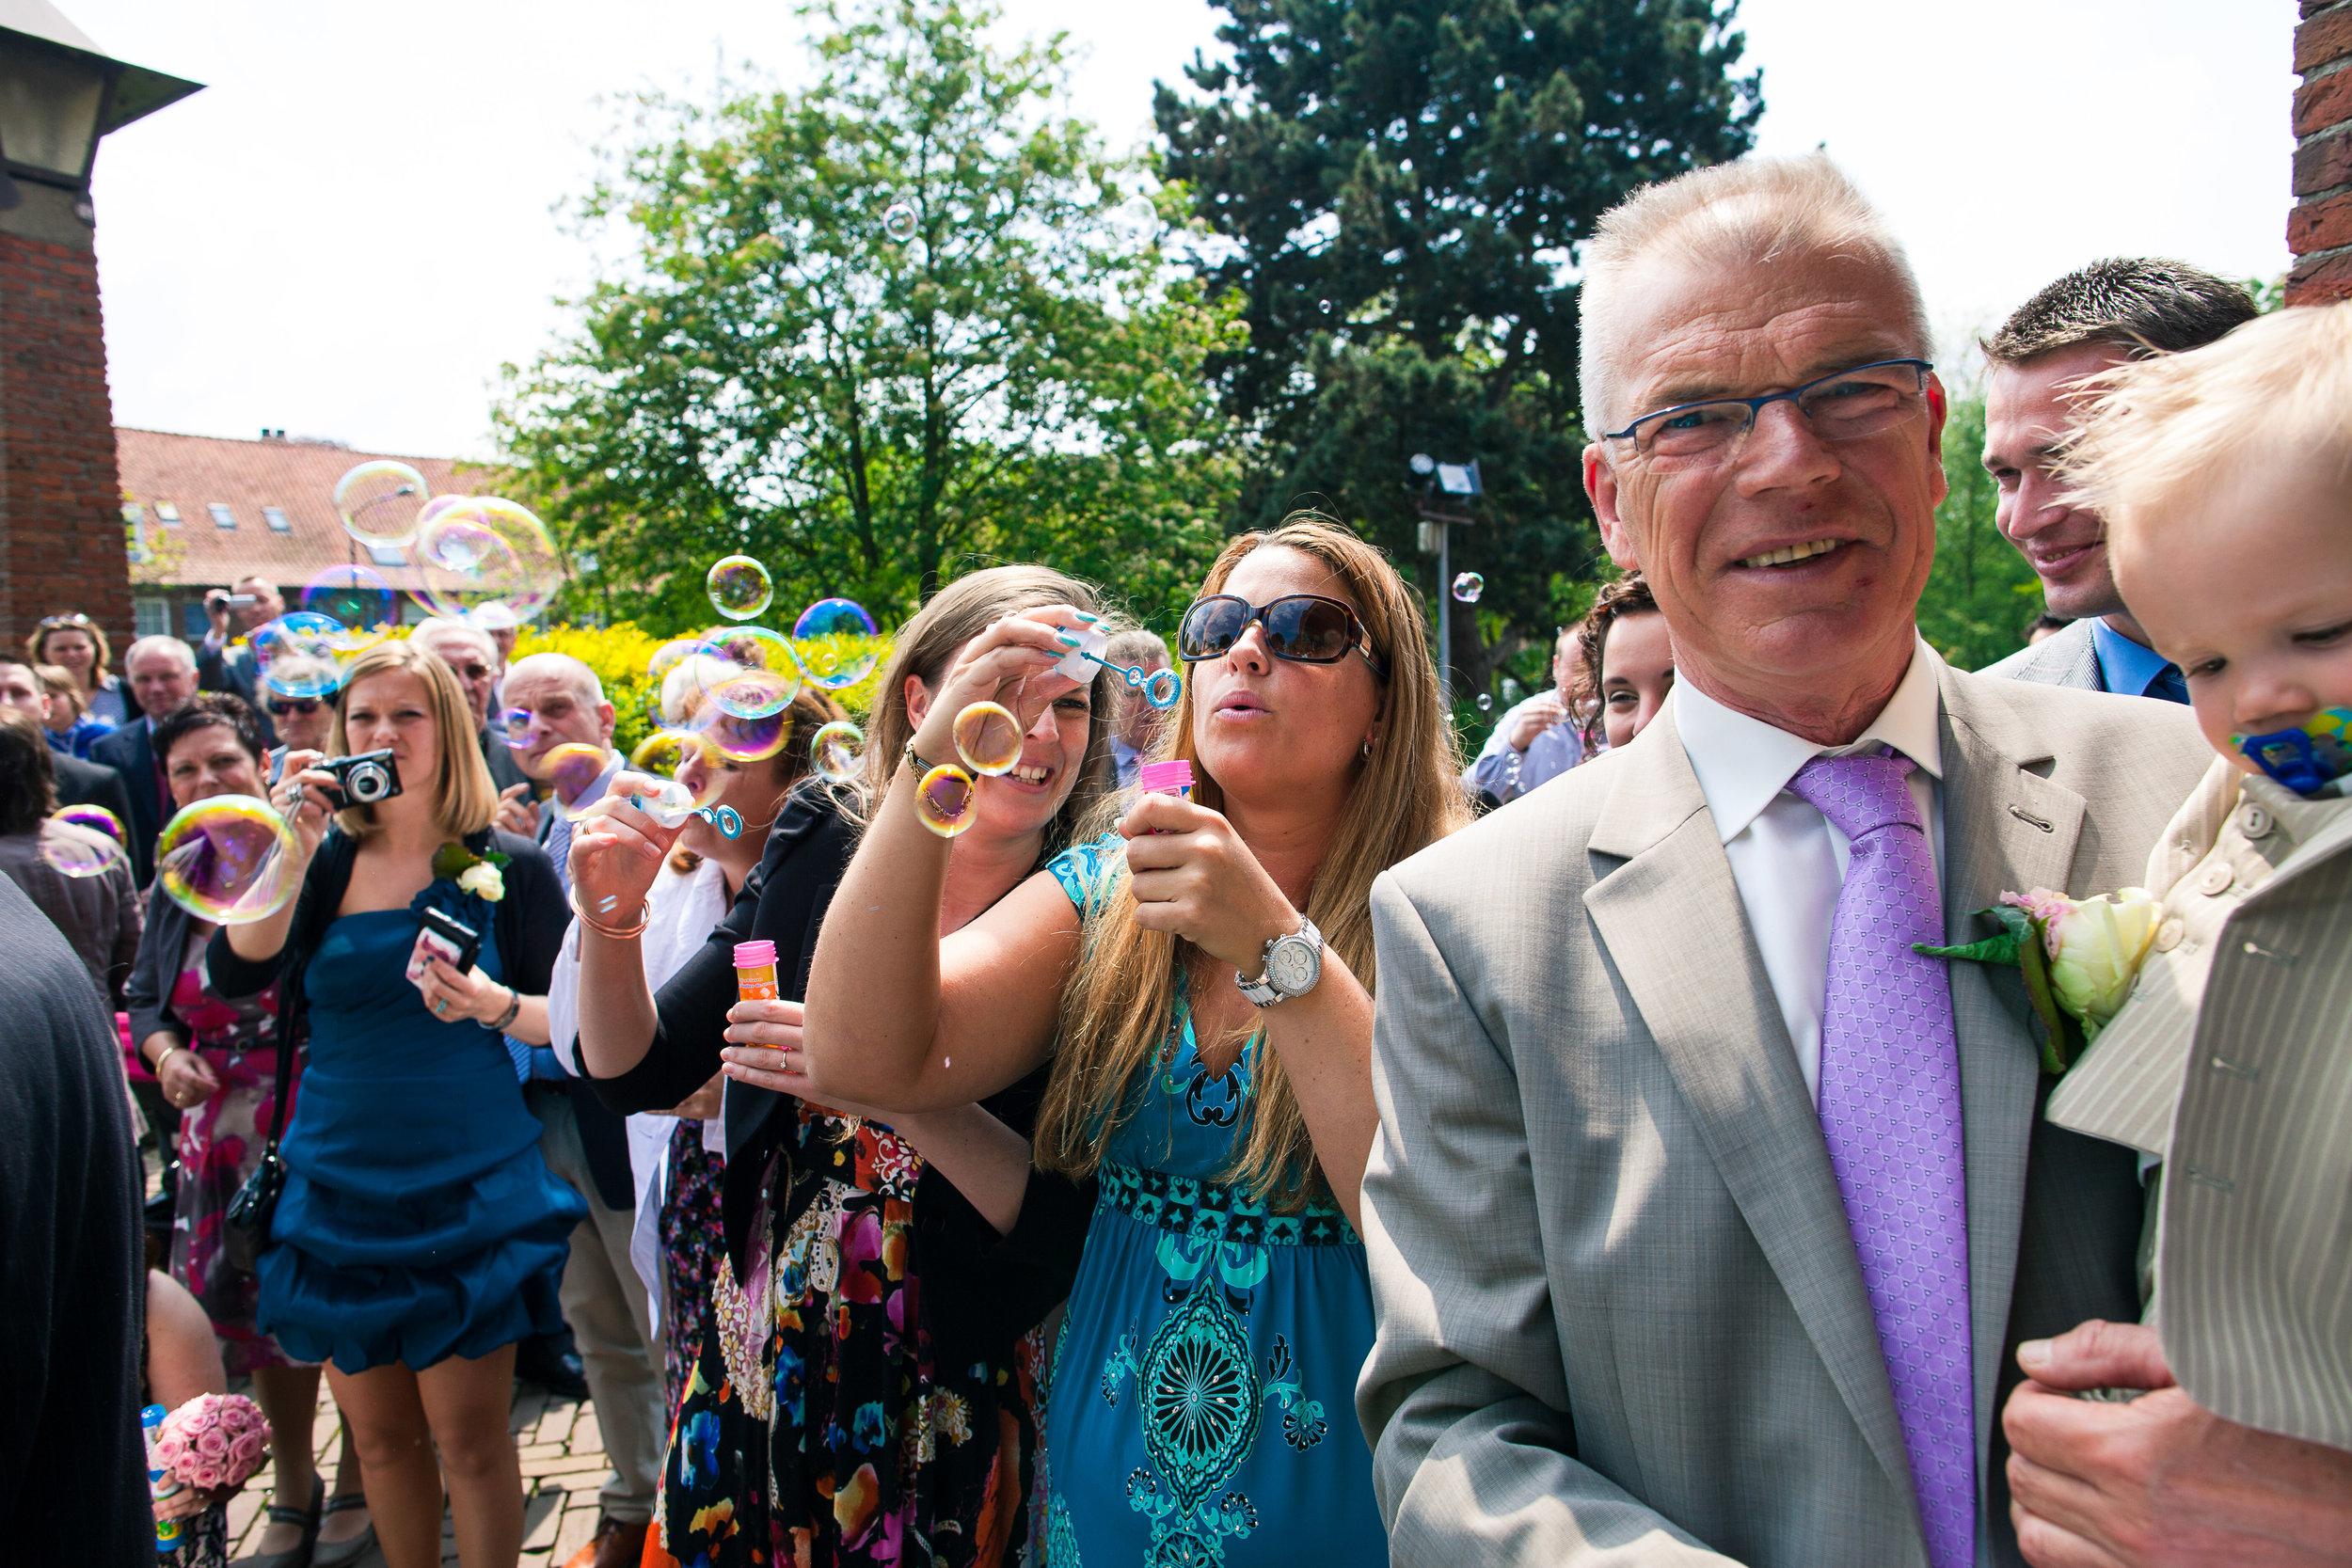 bruidsfotografie-trouwreportage-huwelijksfotografie-bruidsfotograaf-feestfotografie-Anouk en Edgar-68.jpg